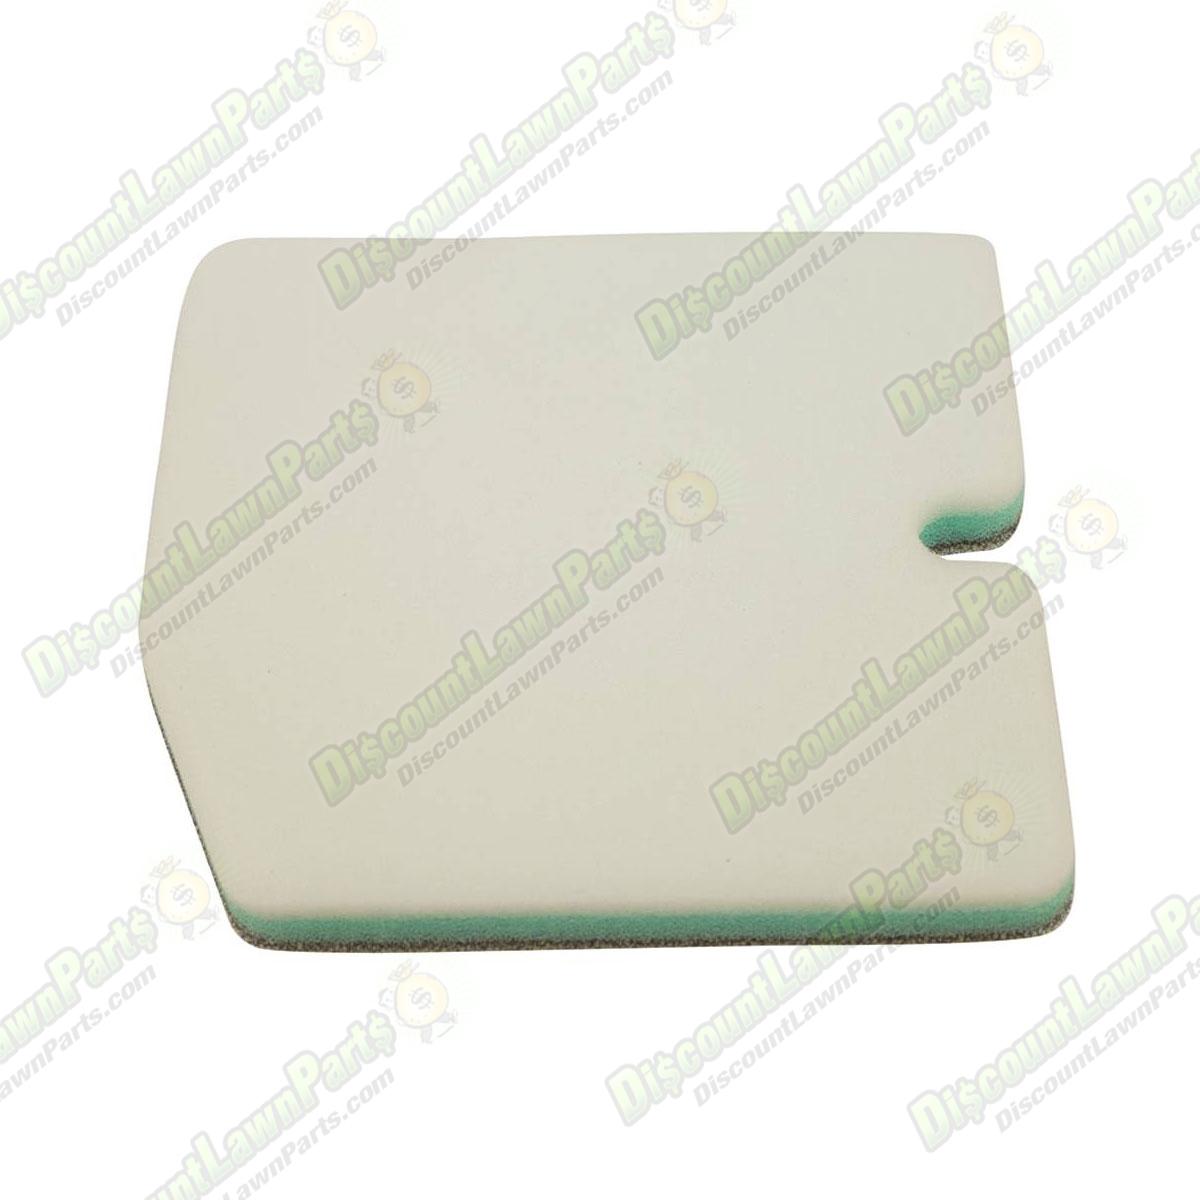 Stens 605-525 Air Filter Kit